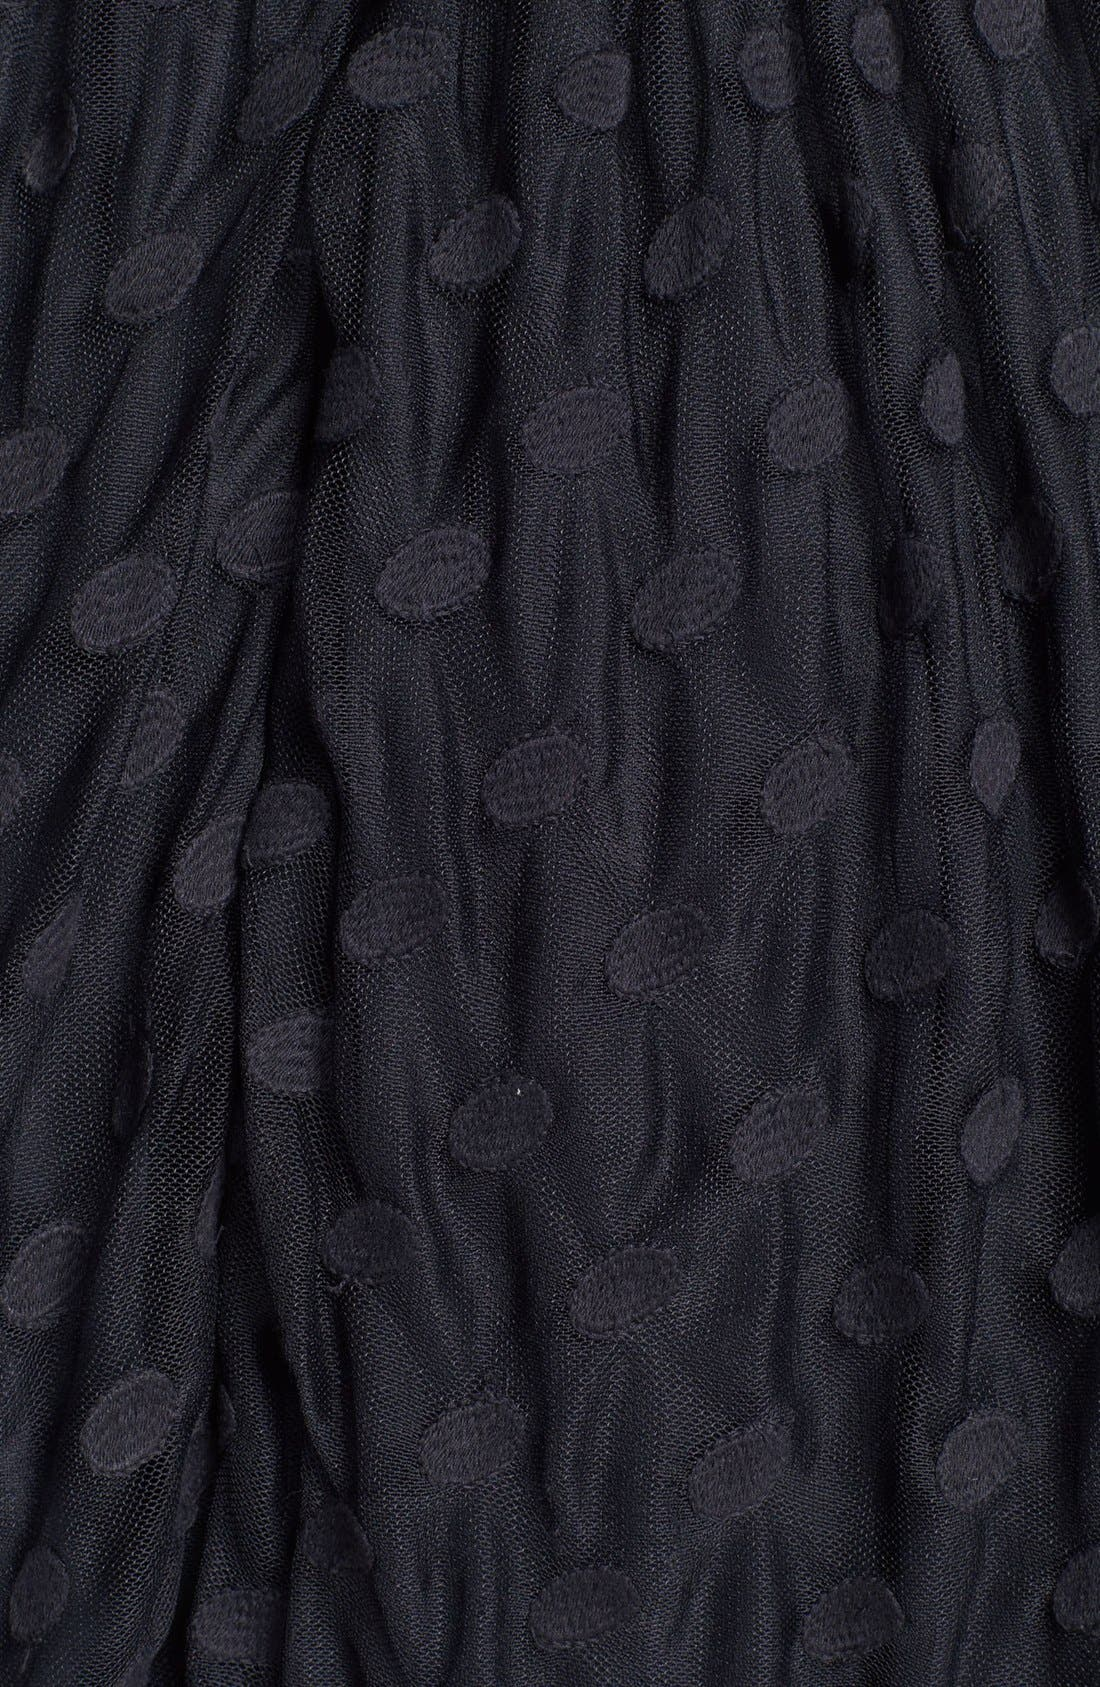 Alternate Image 3  - Jill Jill Stuart Polka Dot Mesh Fit & Flare Dress